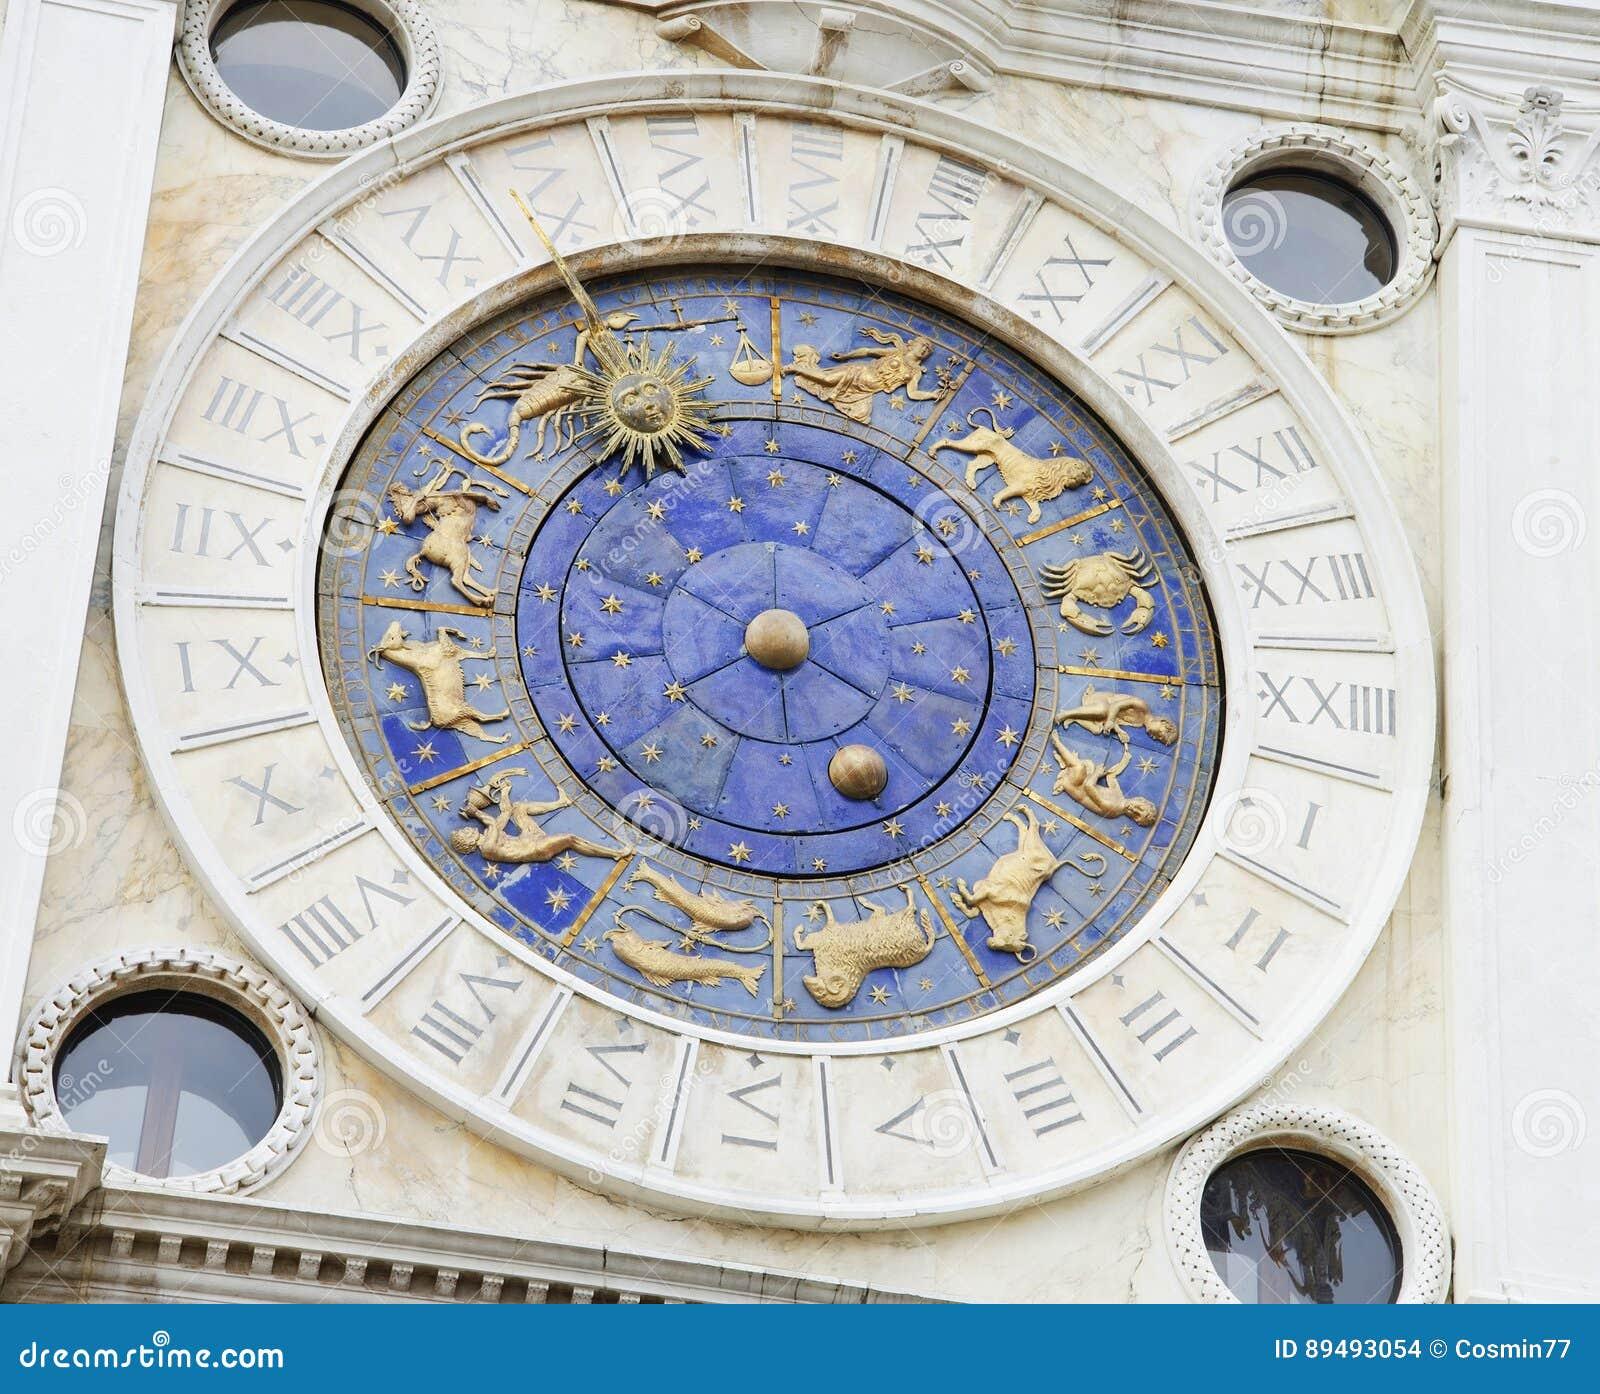 La torre de reloj, detalle arquitectónico, Venecia